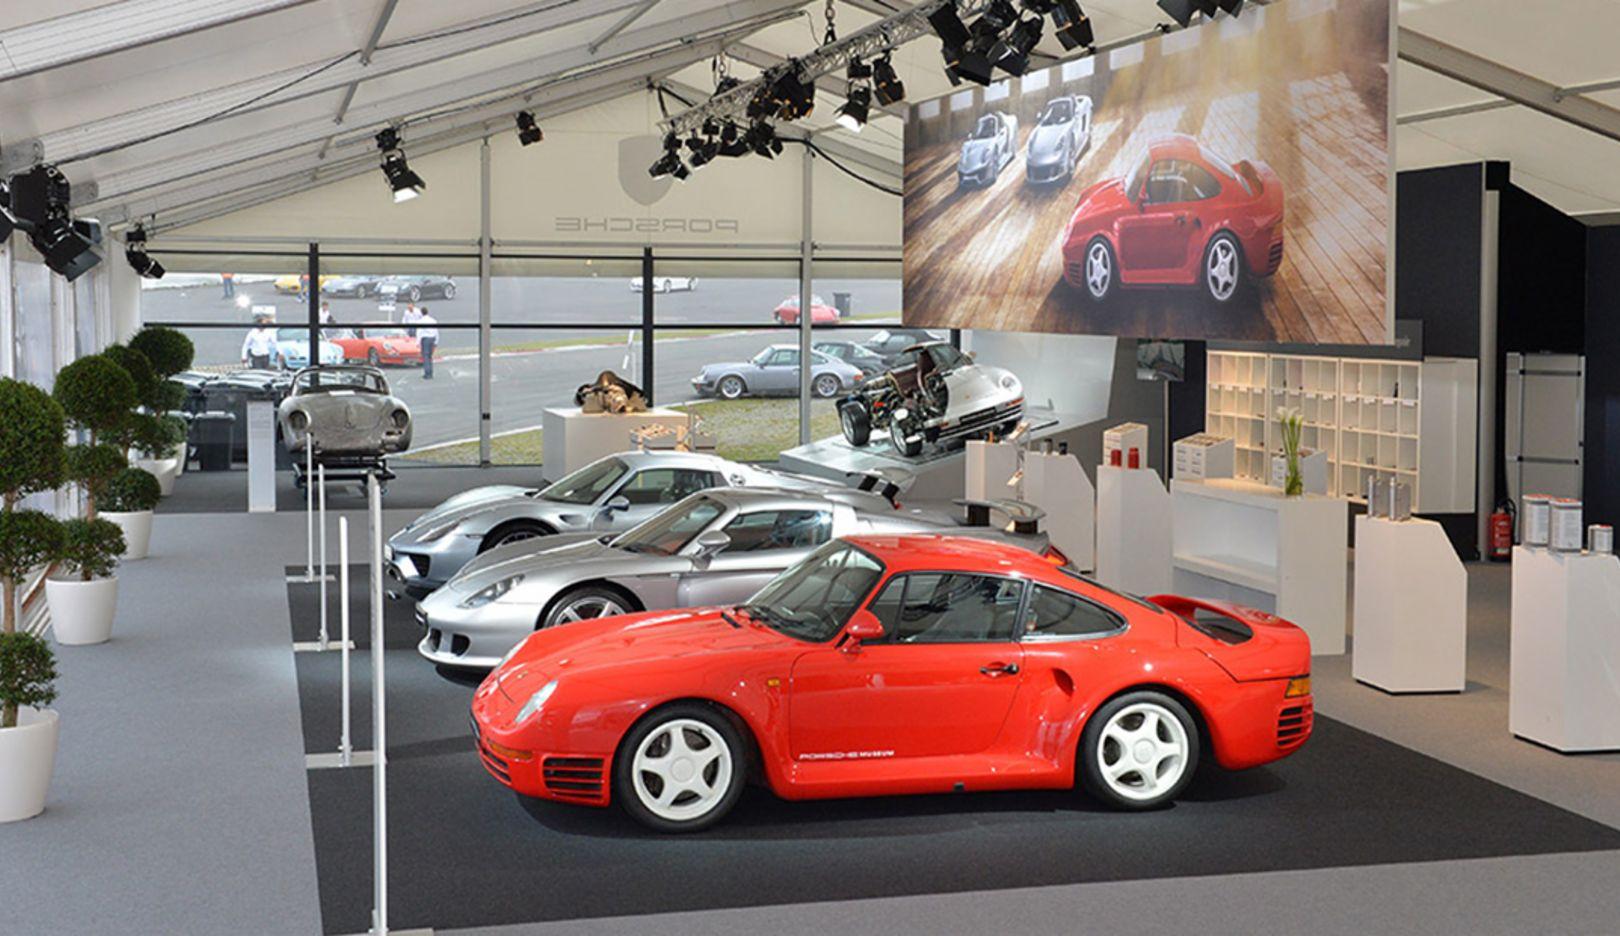 959, Carrera GT, 918 Spyder, Oldtimer Grand Prix 2015, Porsche AG